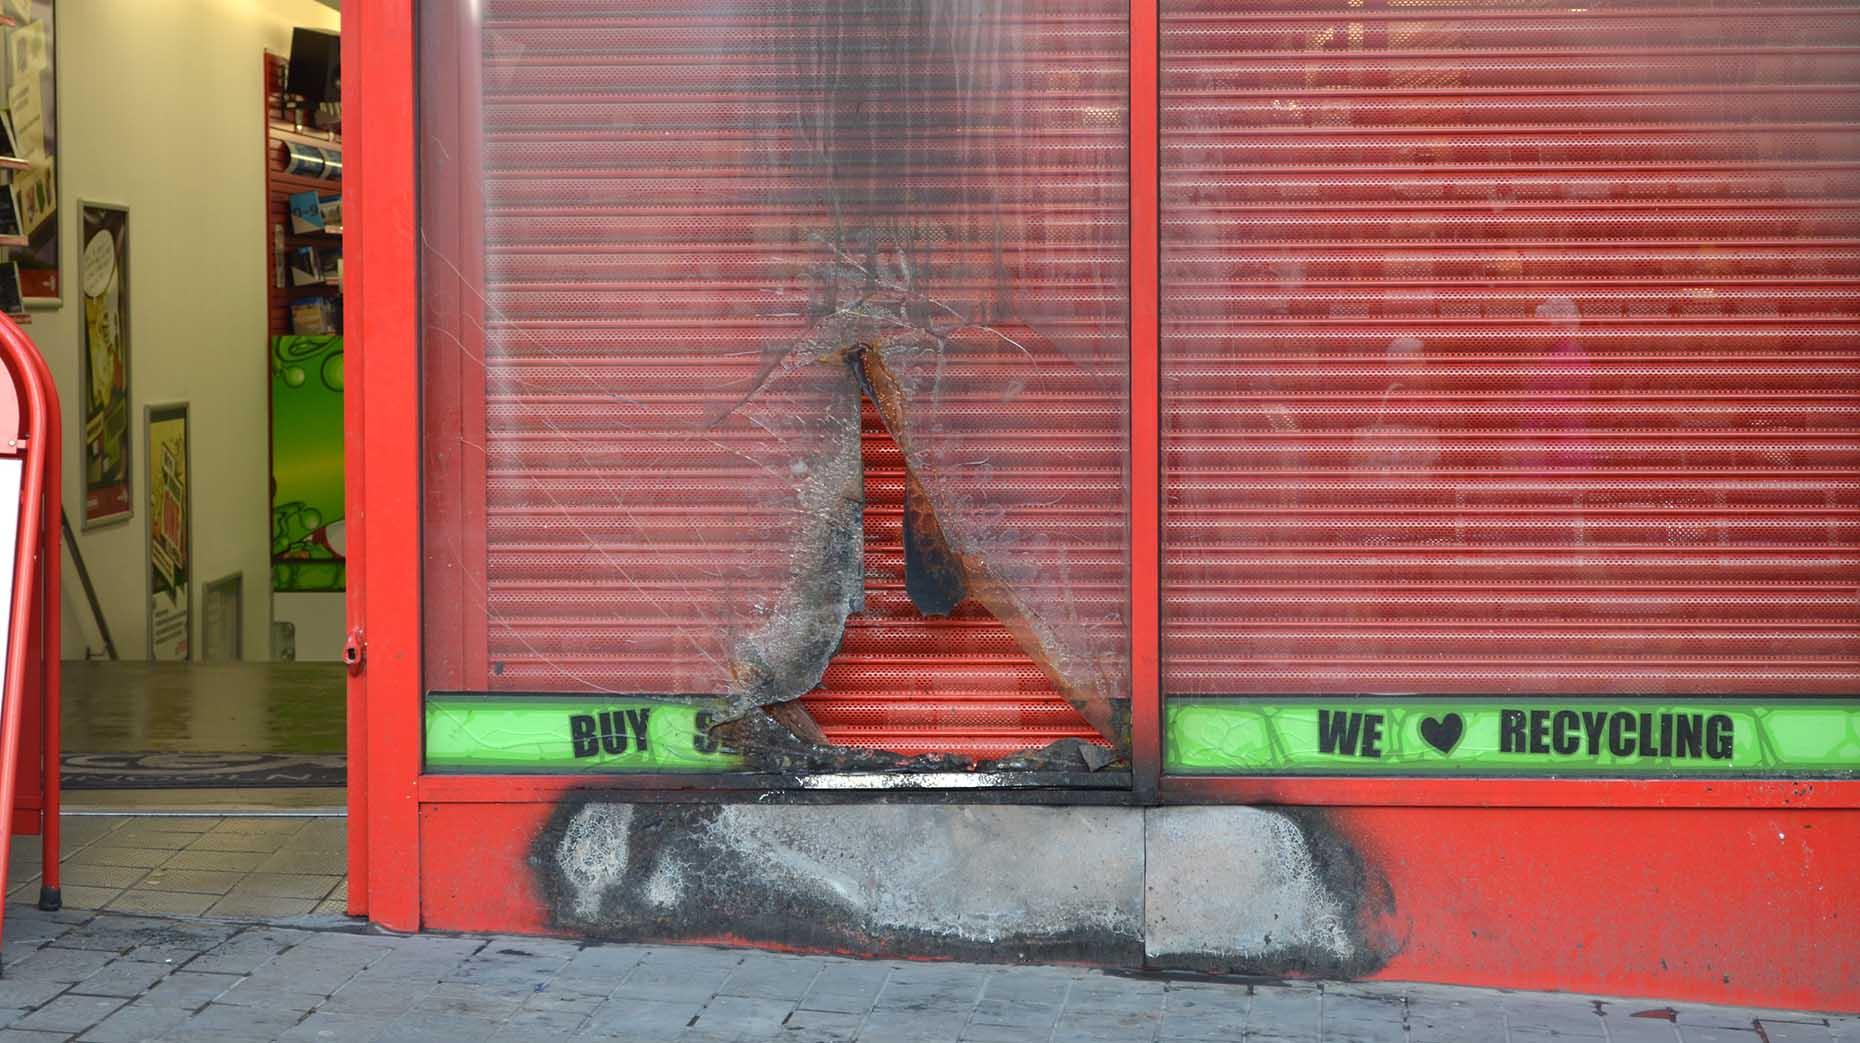 Lincoln Cex Shop Damaged By Deliberate Fire The Lincolnite